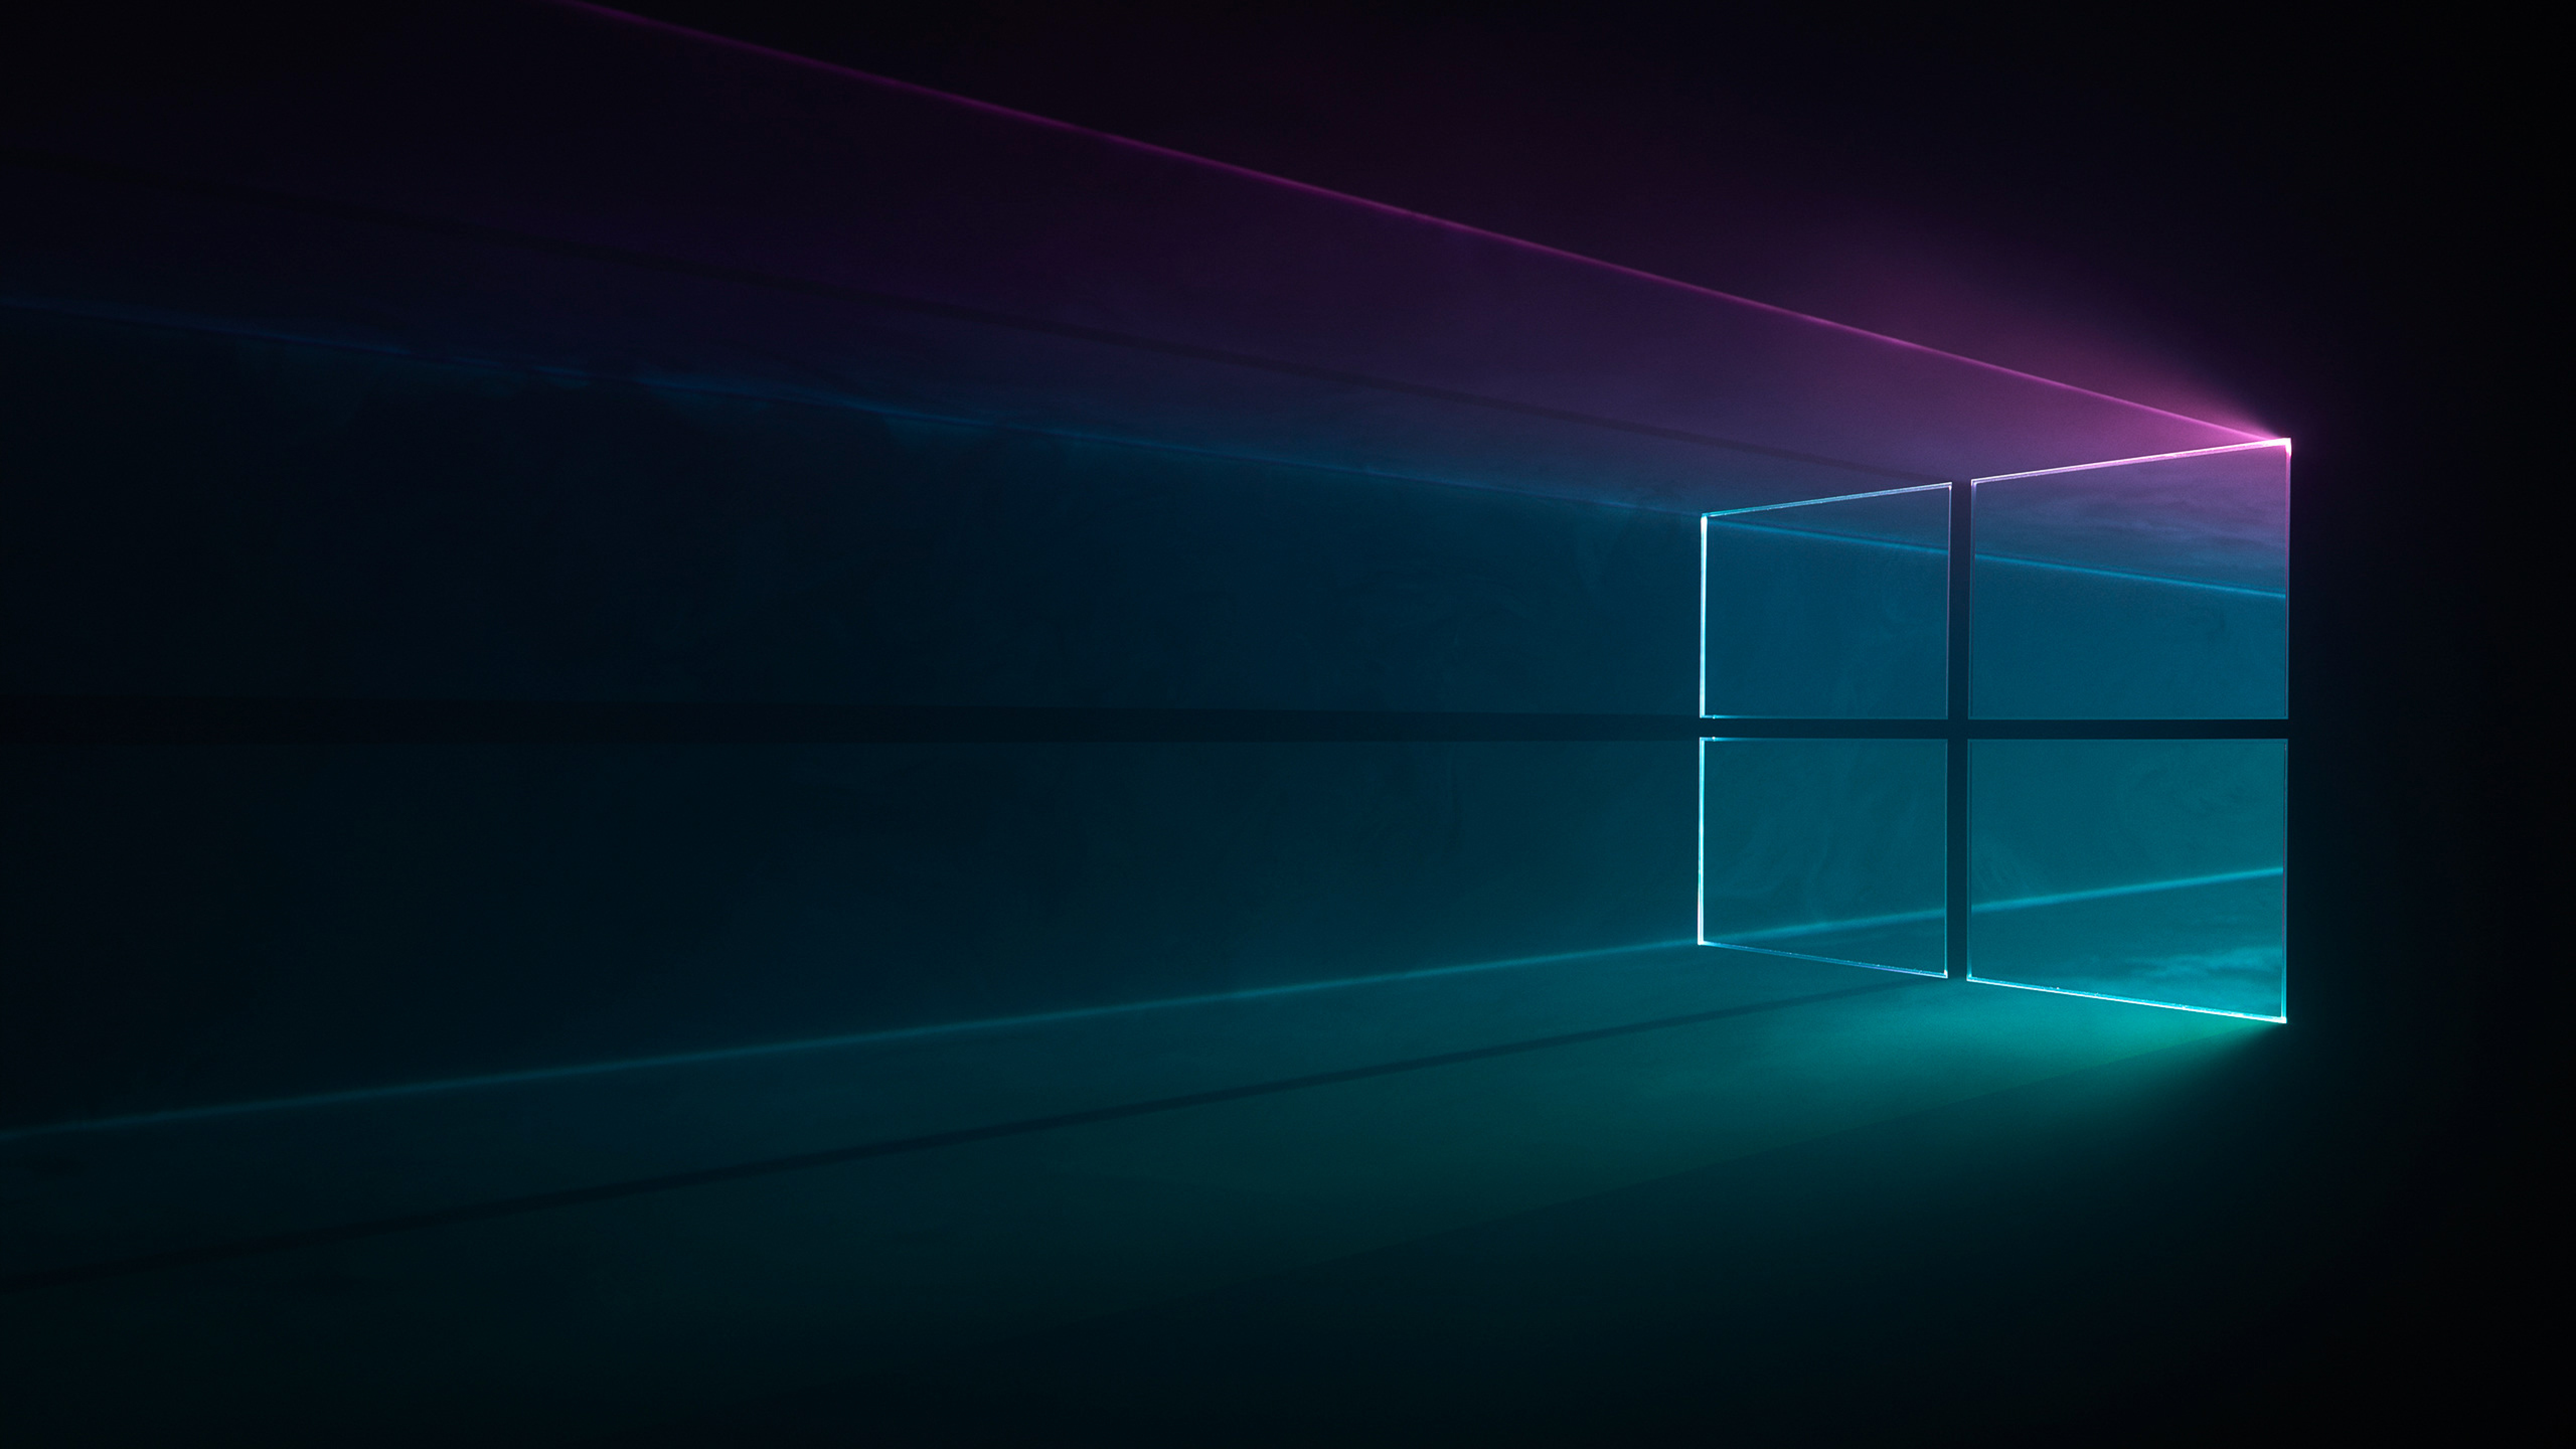 7680x4320 Windows 10 Dark 8k Wallpaper Hd Hi Tech 4k Wallpapers Images Photos And Background